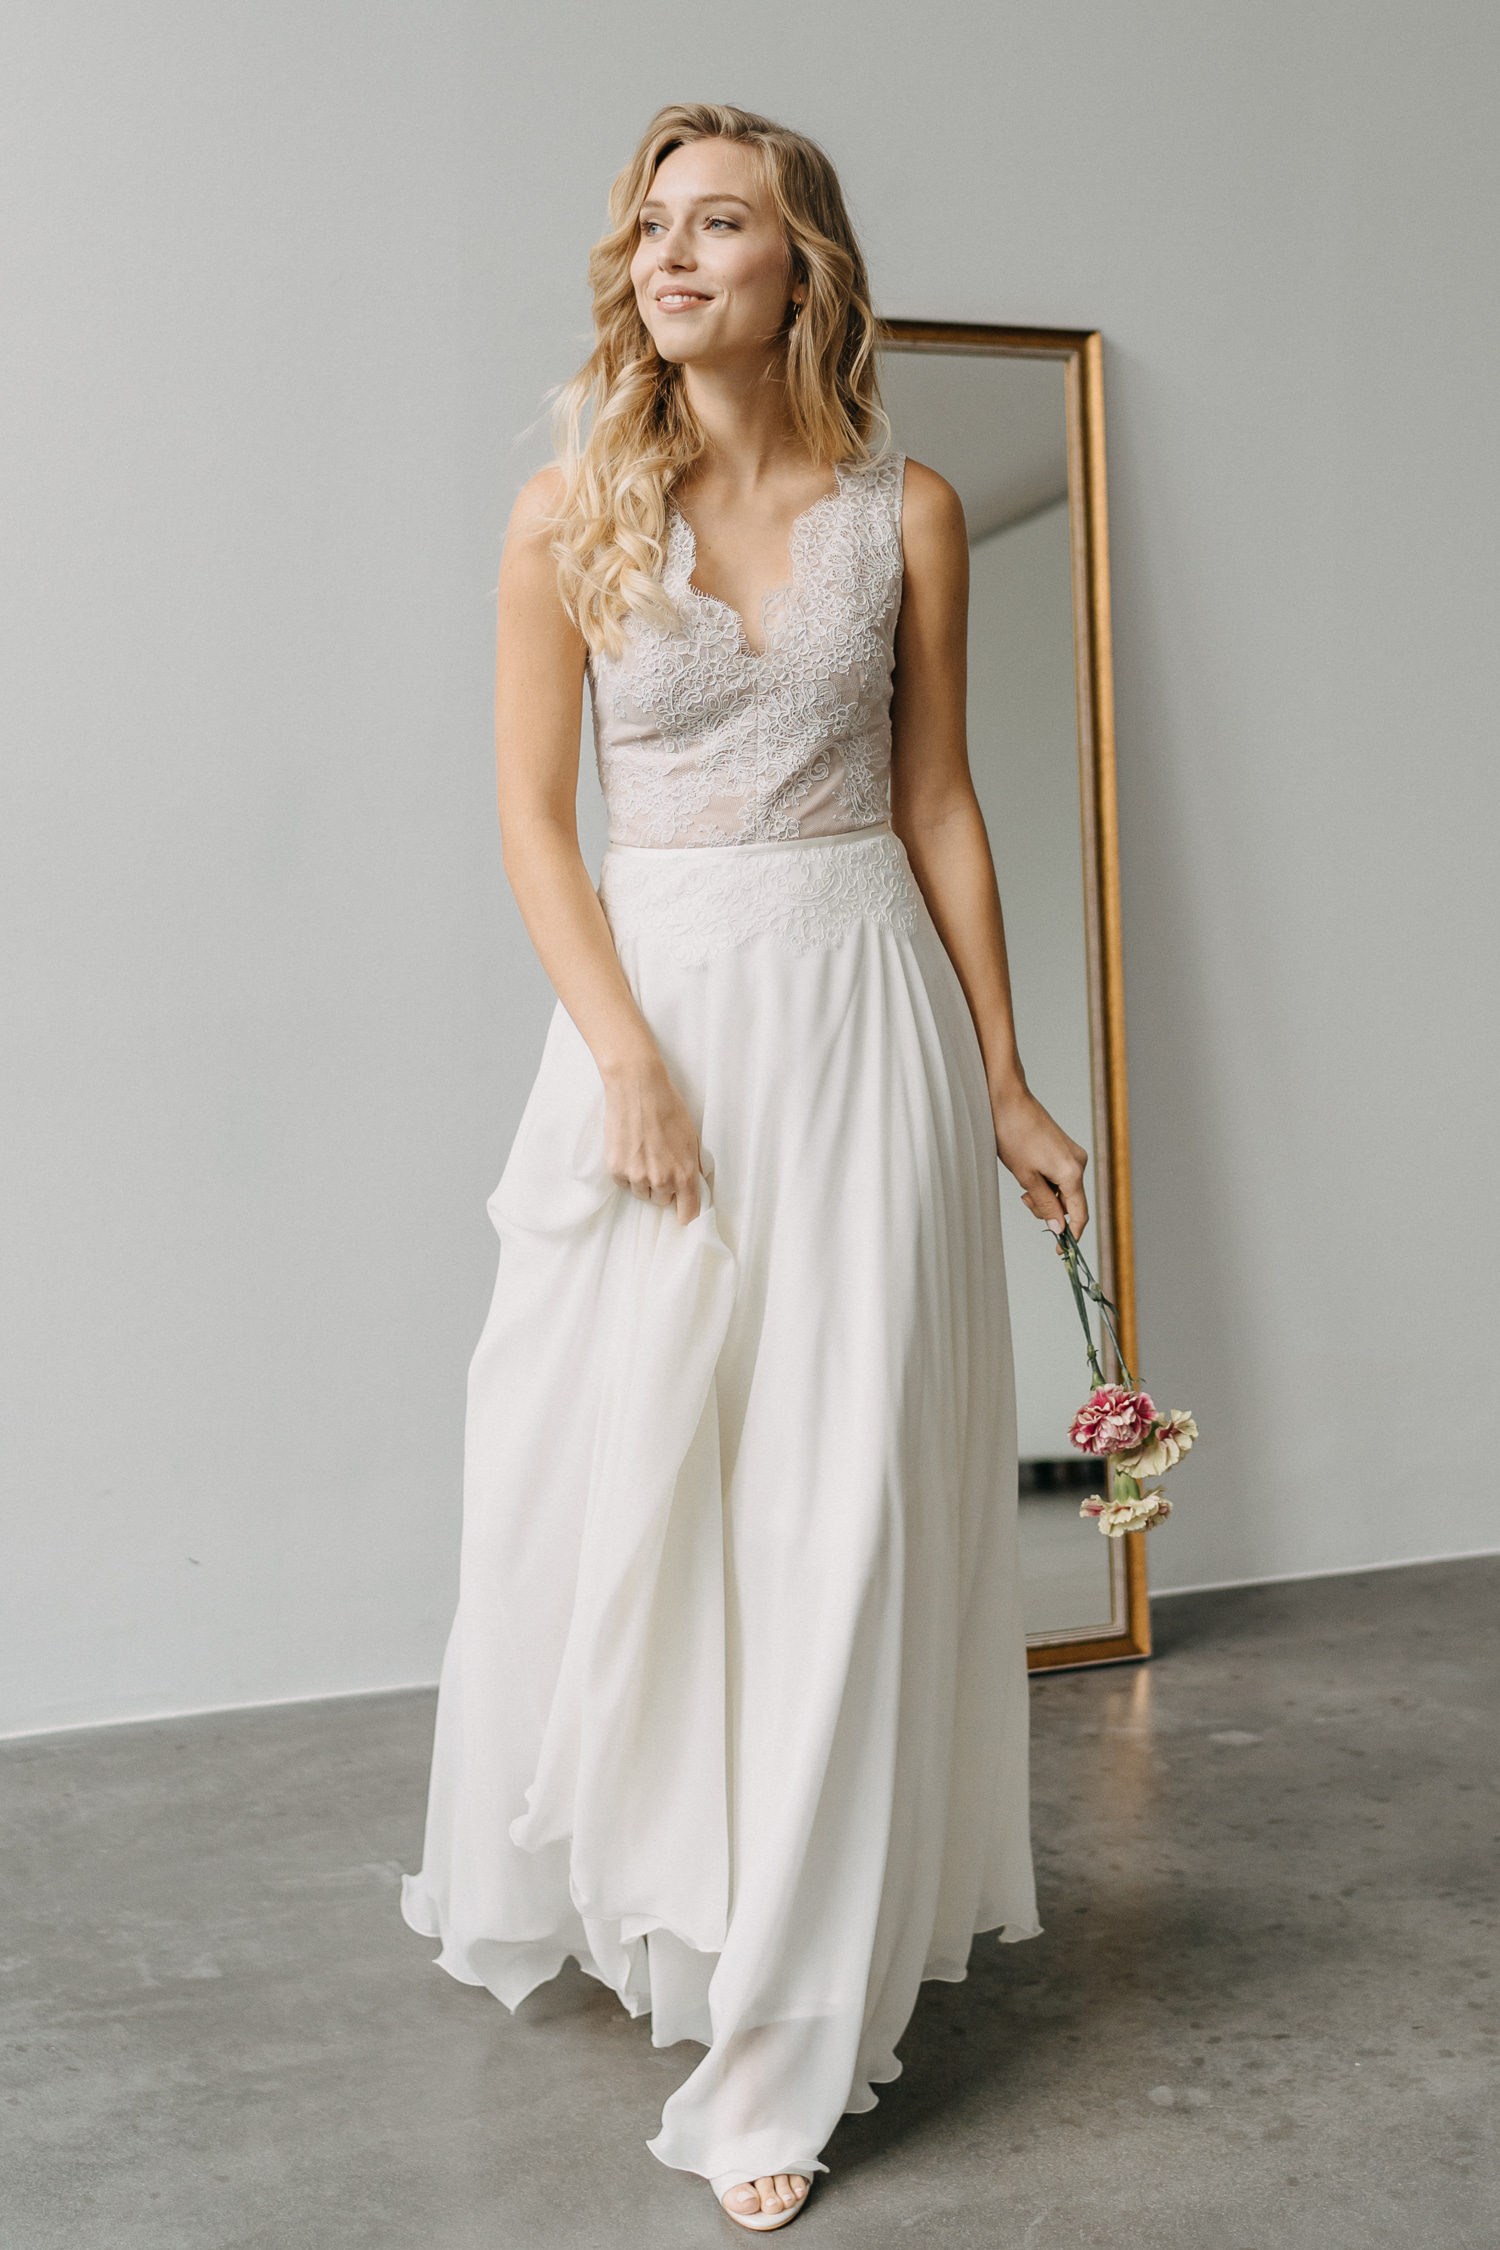 2021 Claudia Heller Brautmode Brautkleid Lilli – gesehen bei frauimmer-herrewig.de